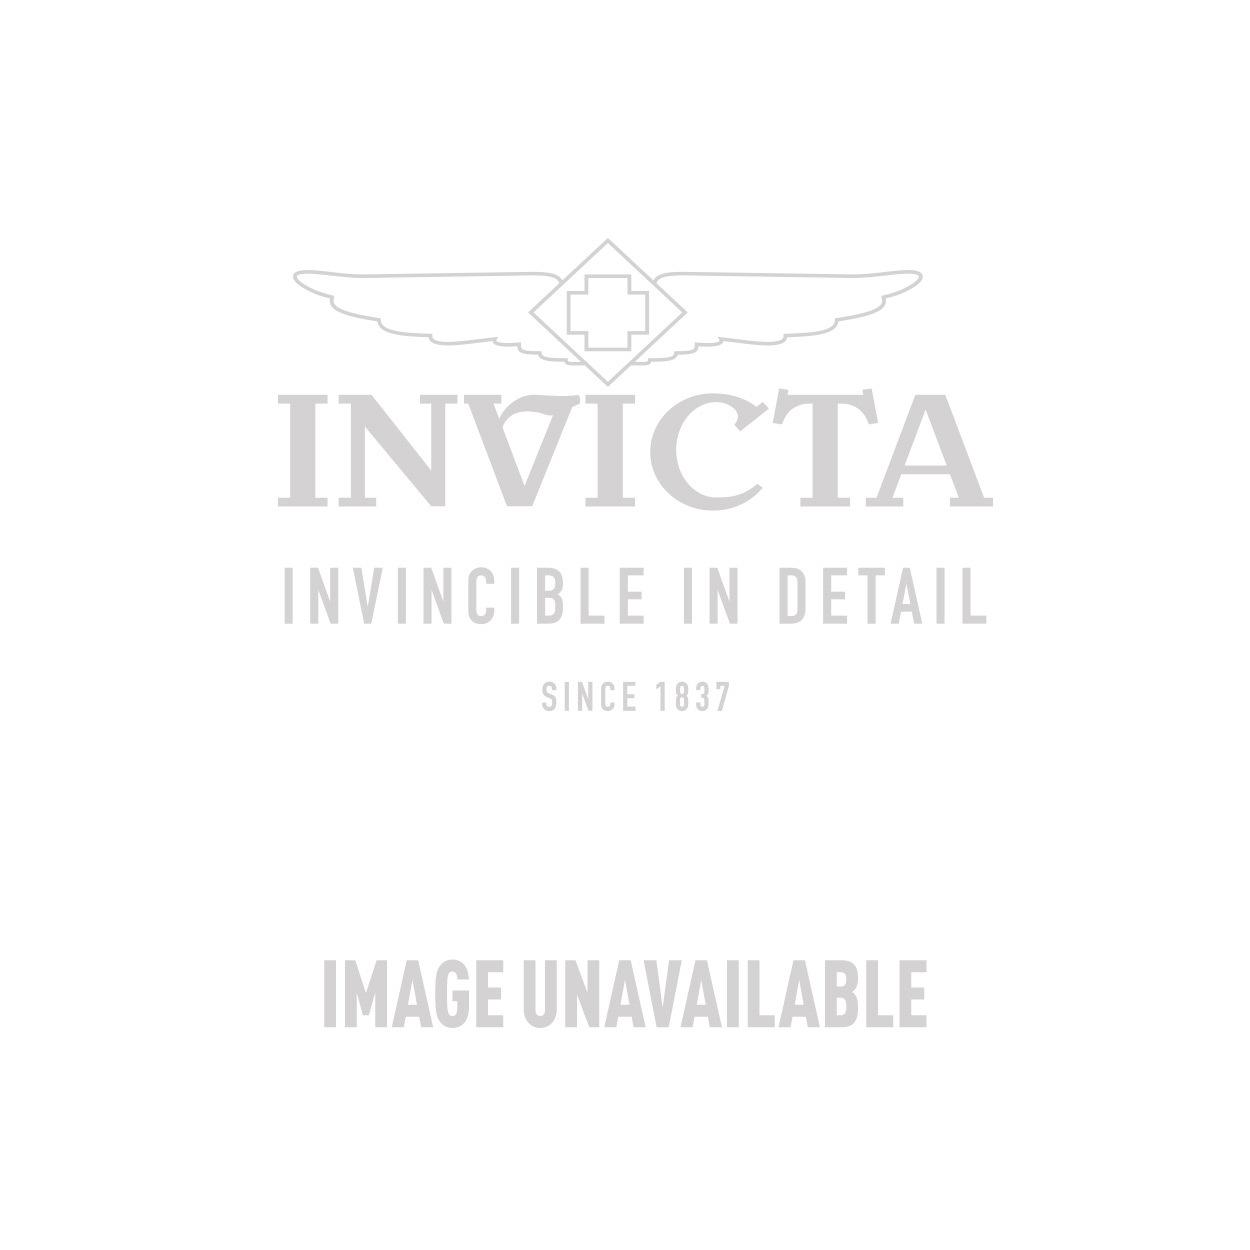 Invicta Subaqua Swiss Movement Quartz Watch - Grey, Stainless Steel case with Black, Grey tone Polyurethane band - Model 10105